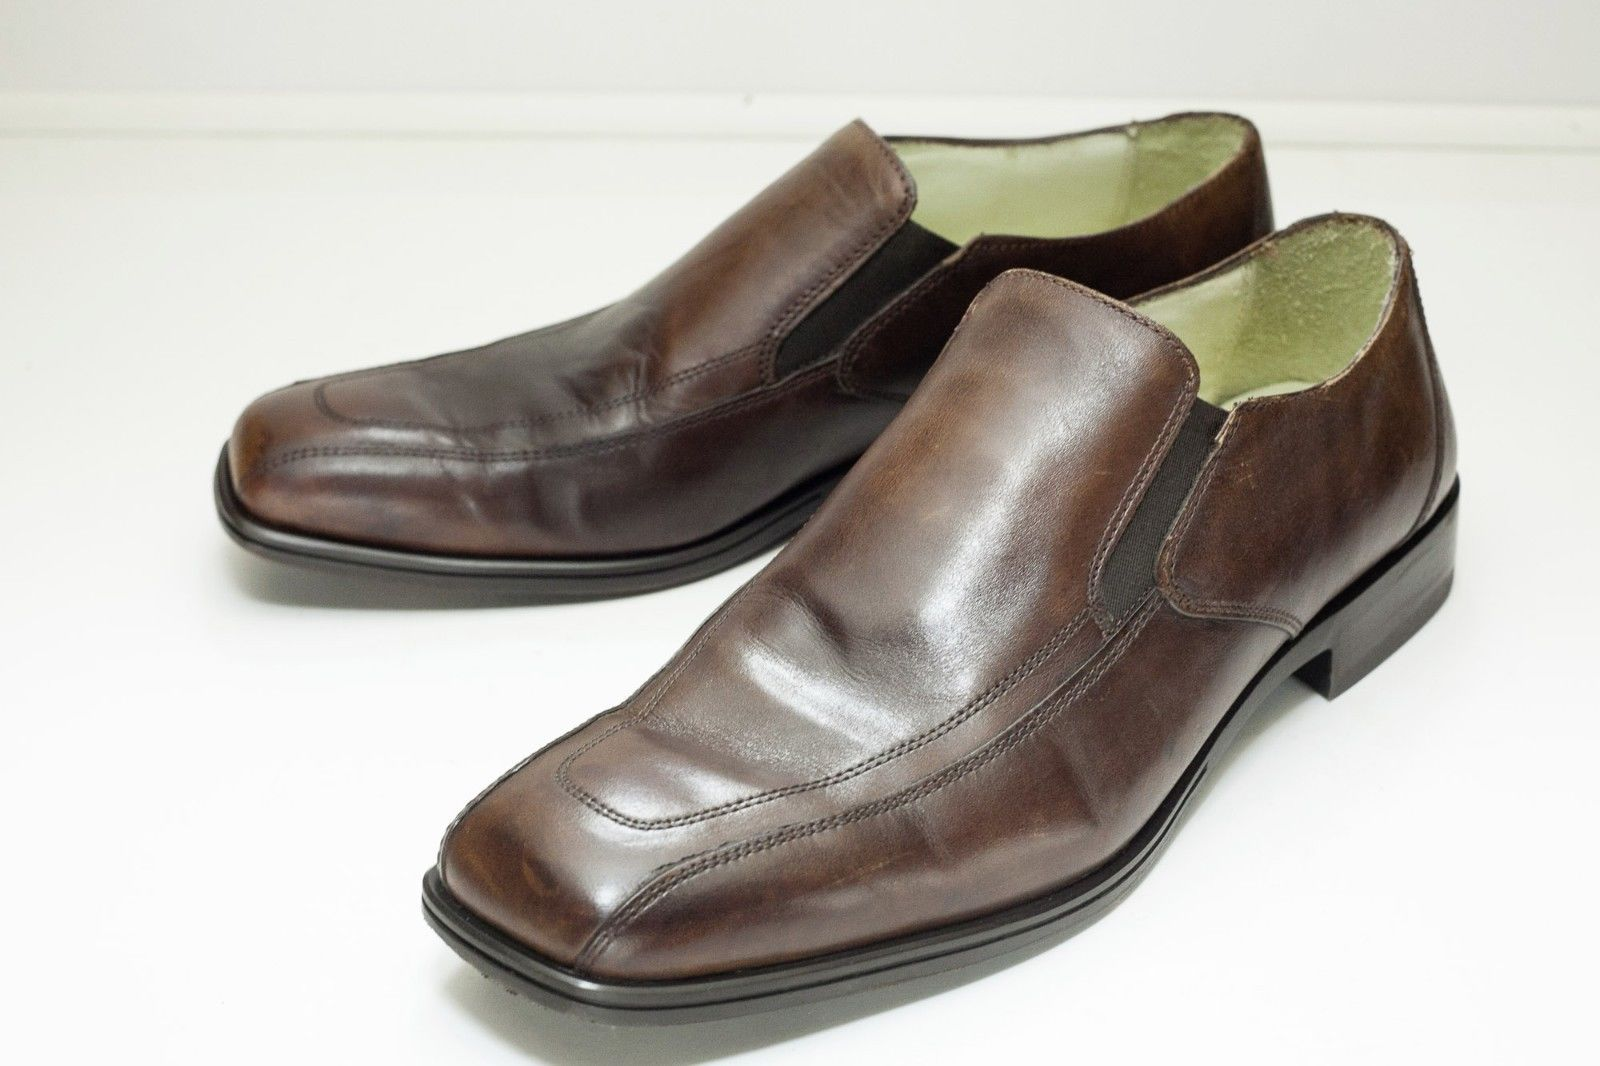 Kenneth Cole 11 Brown Slip-On Dress Shoes Men's - $42.00